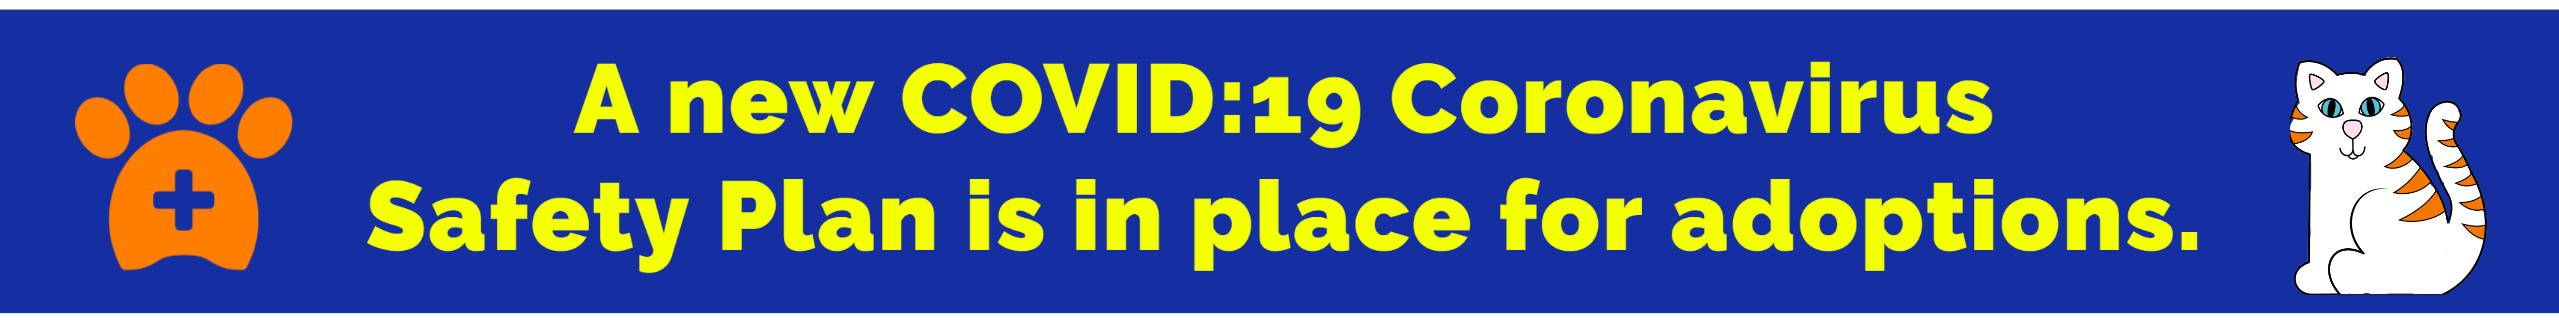 CLOSED-COVID-19-Desktop-1